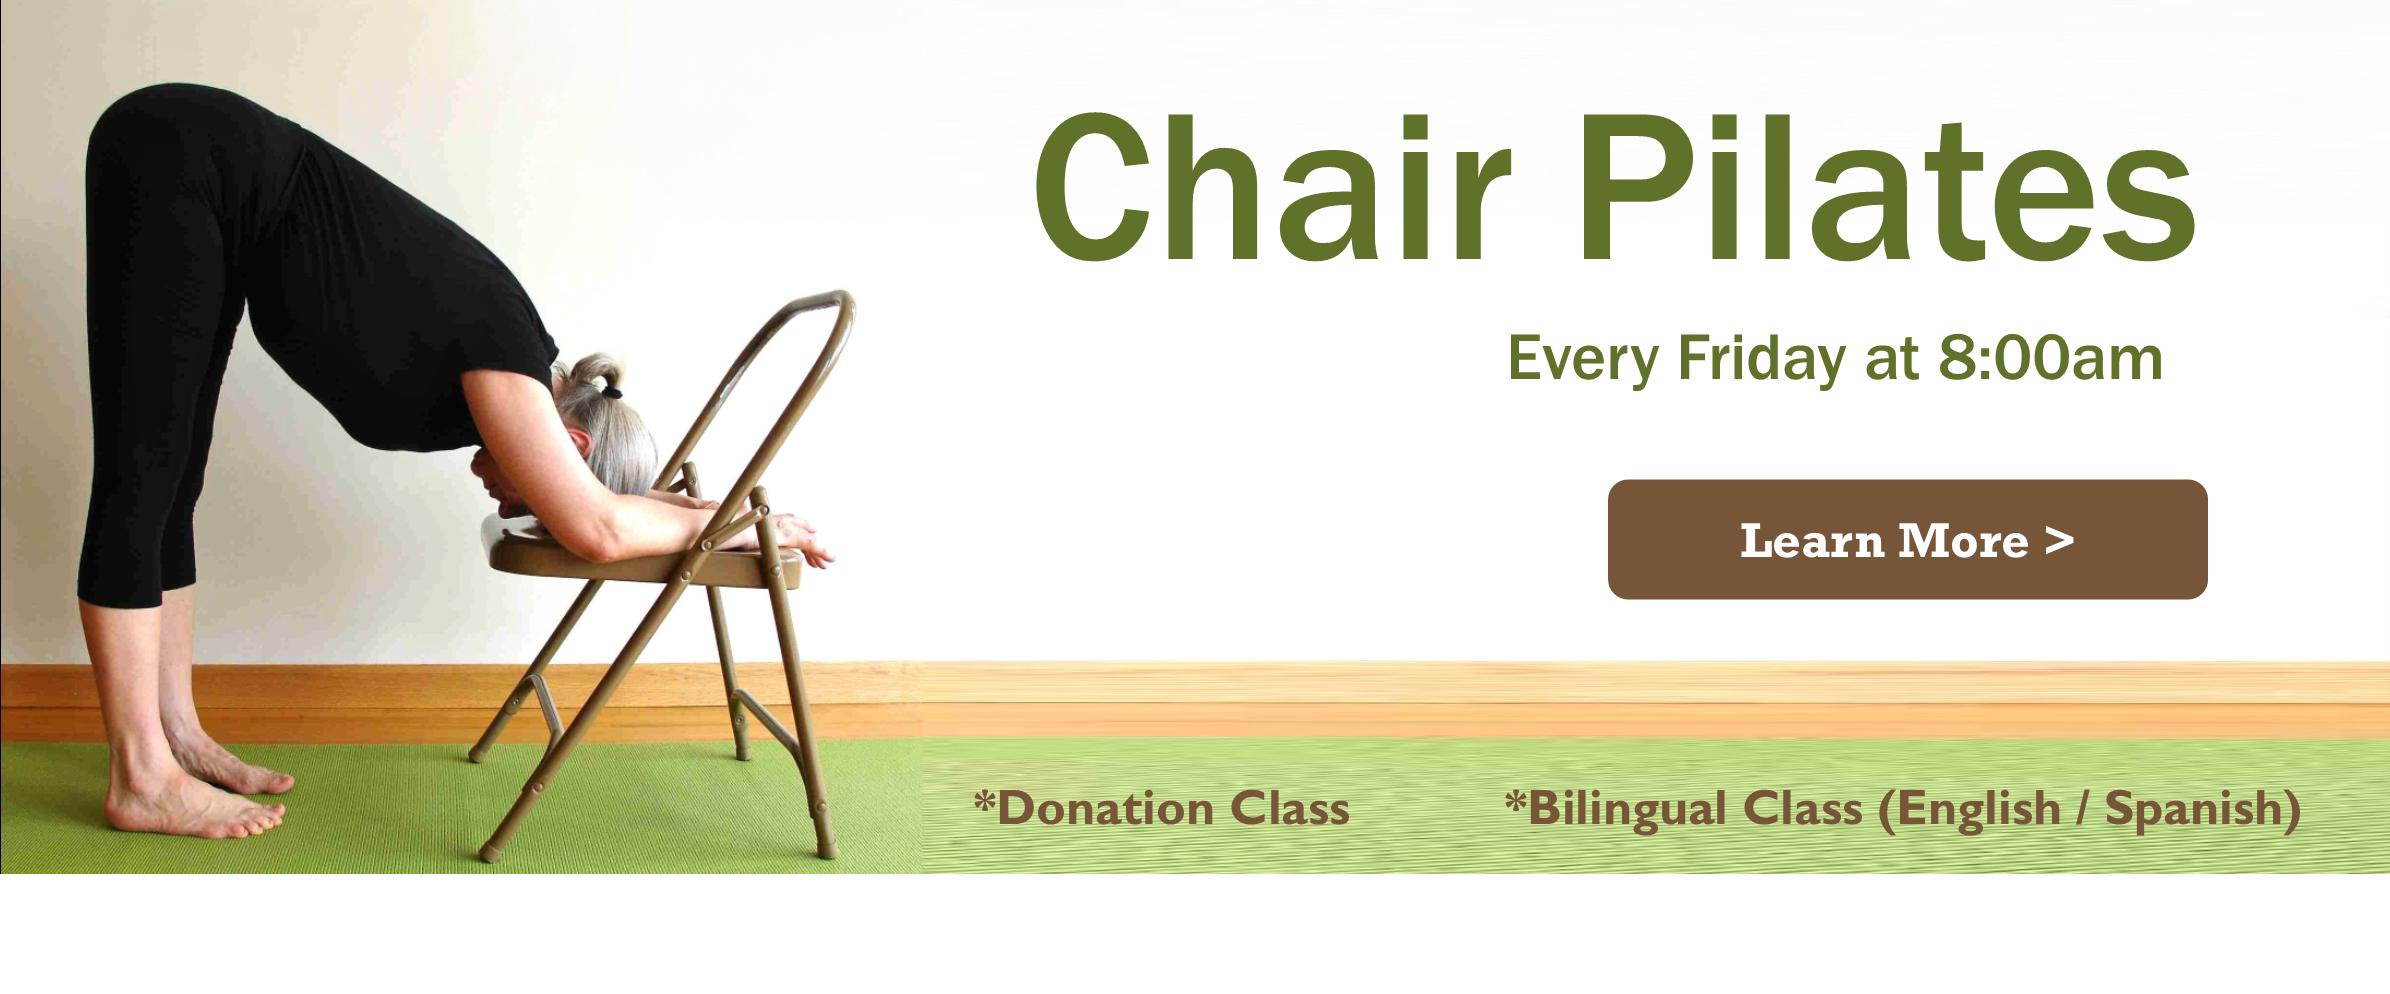 Chair-Pilates-Banner